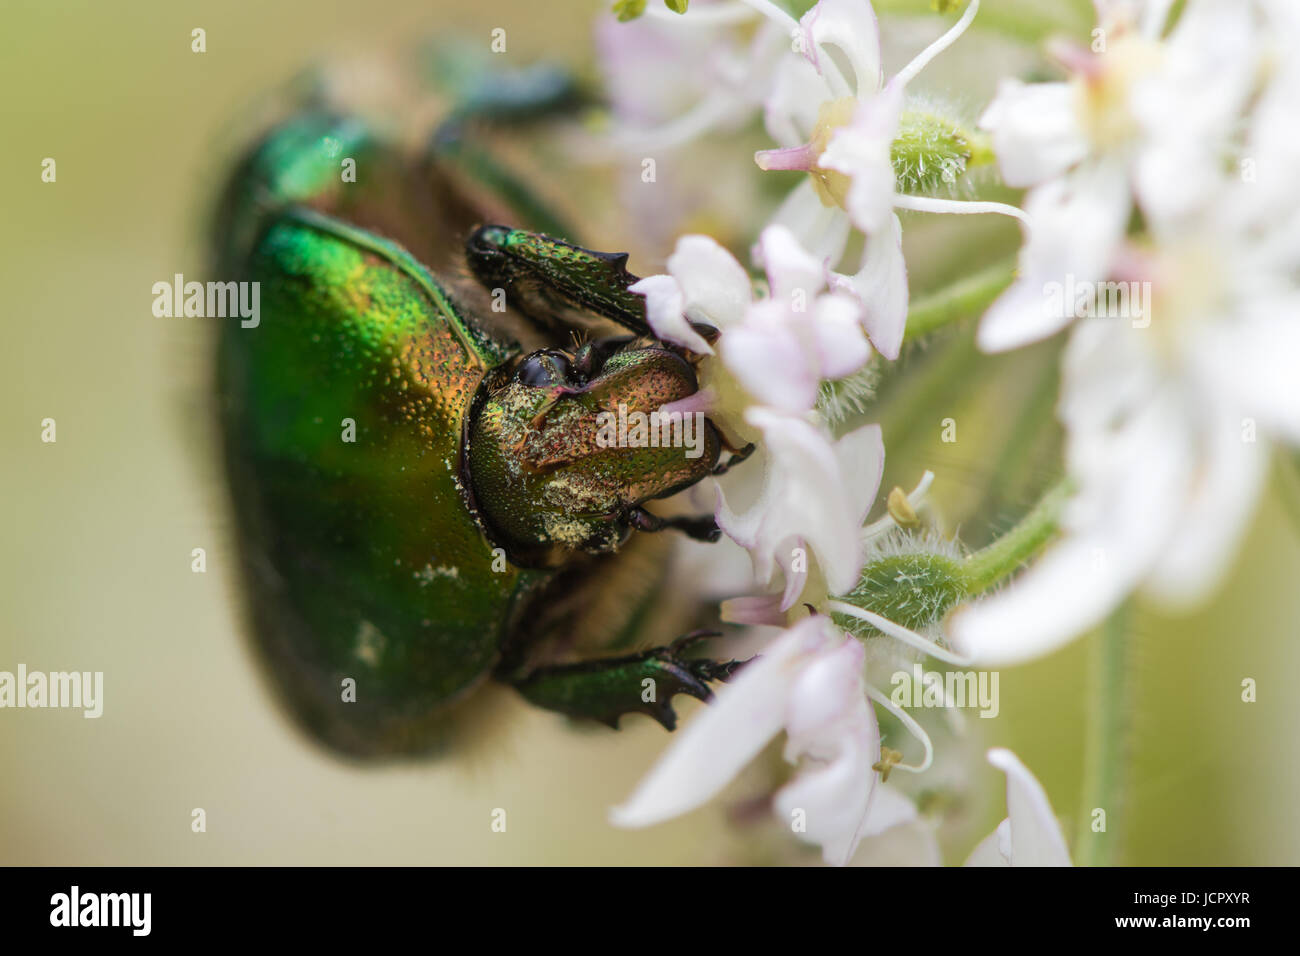 Rose chafer (Cetonia aurata) feeding on hogweed (Heracleum sphondylium). Large green beetle in the family Scarabaeidae - Stock Image